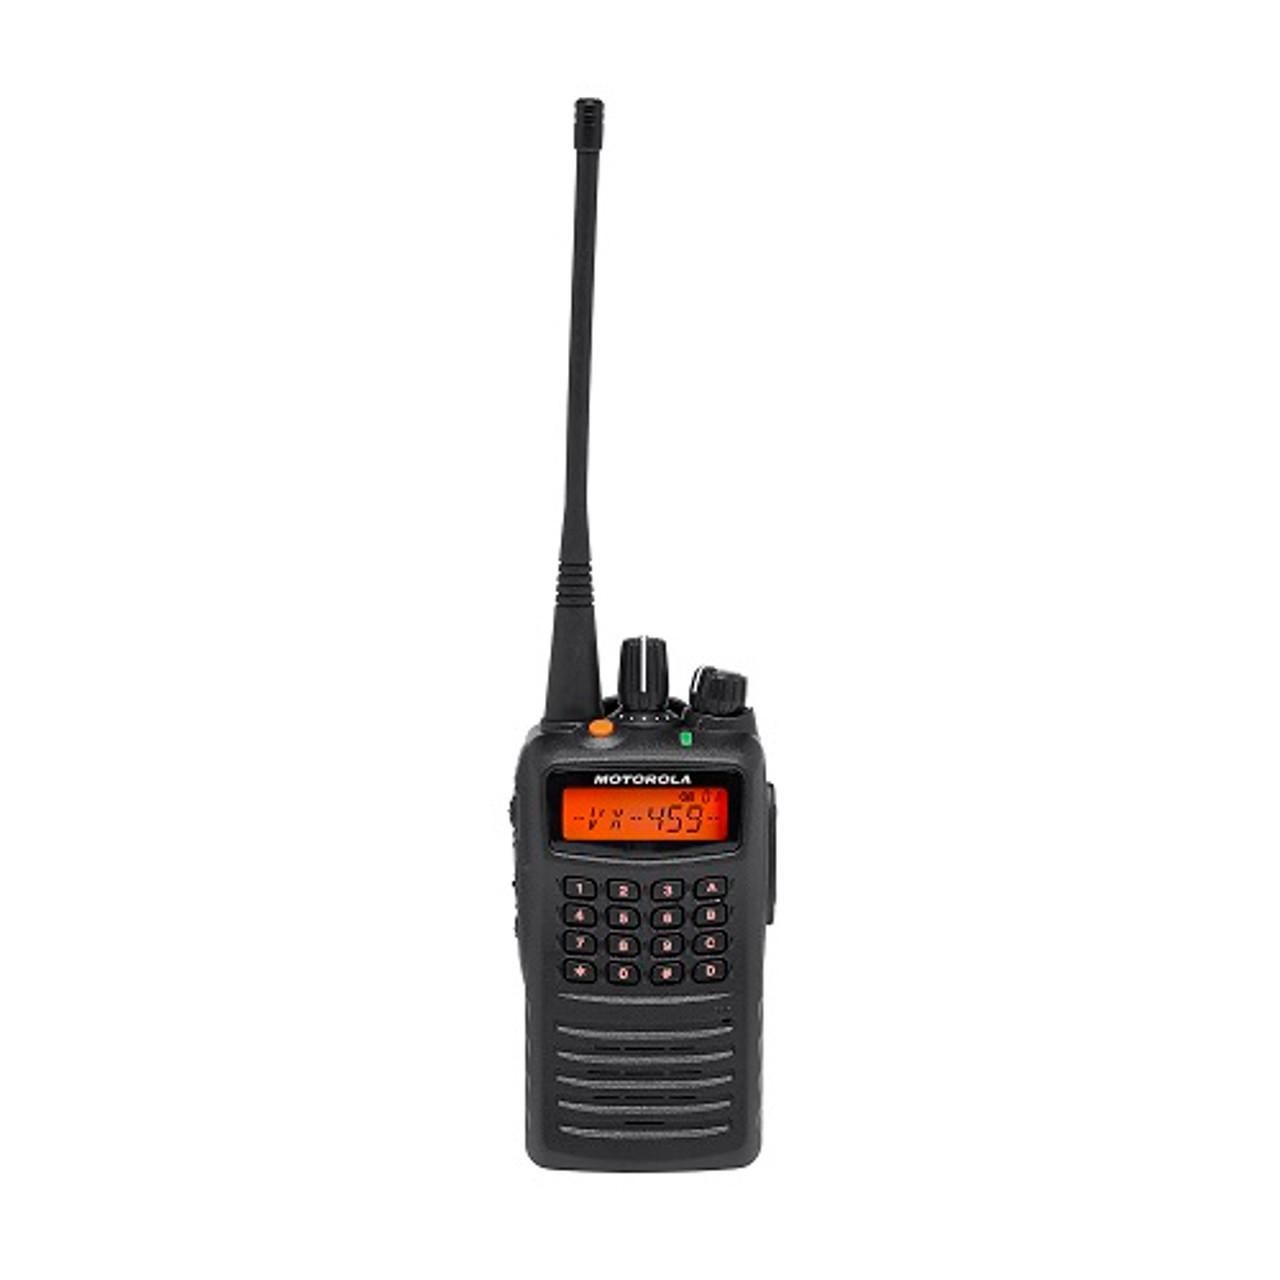 Motorola VX-459 UHF Two Way Radio